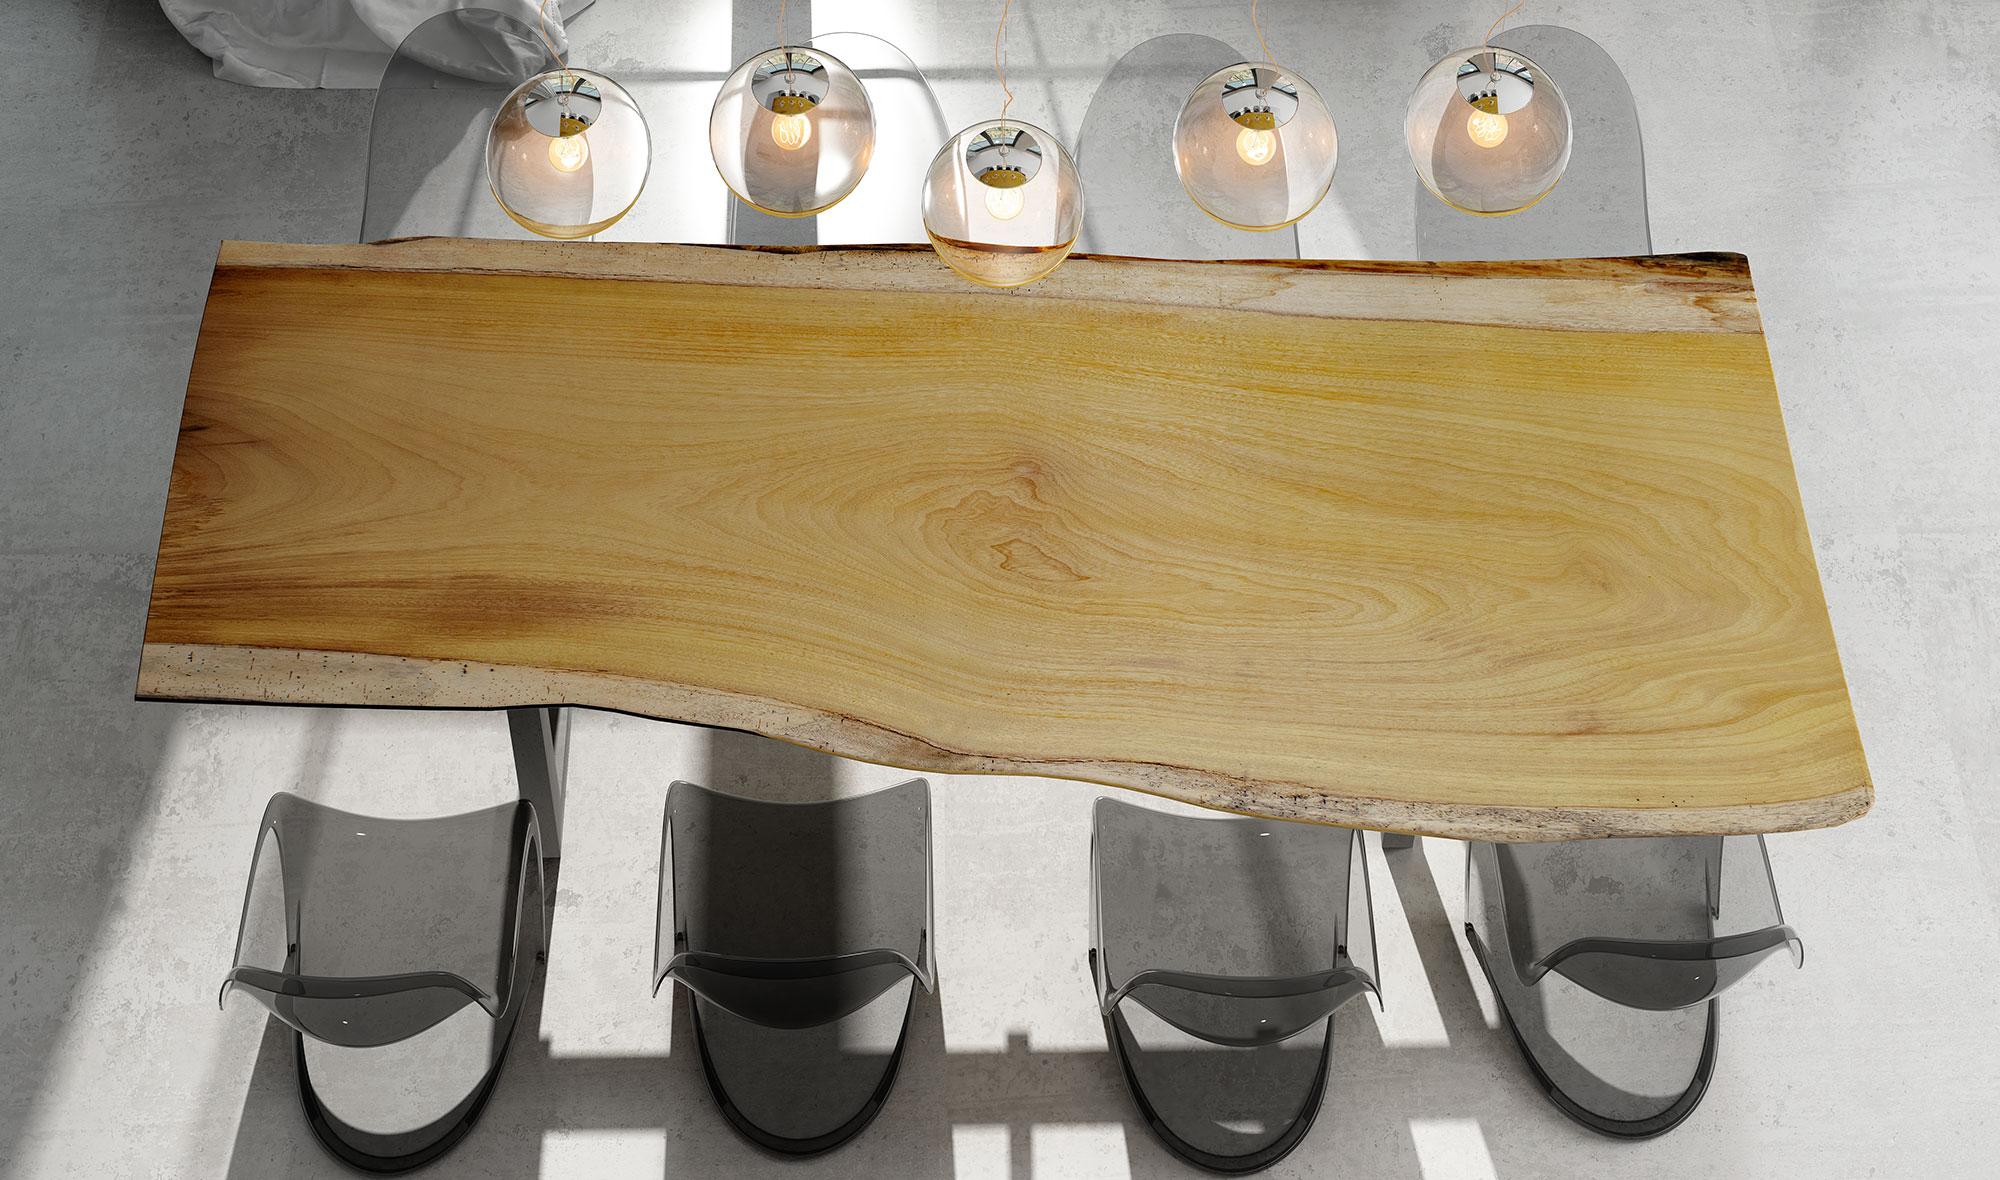 Mesa de comedor madera maciza iroko Arges de lujo en ...